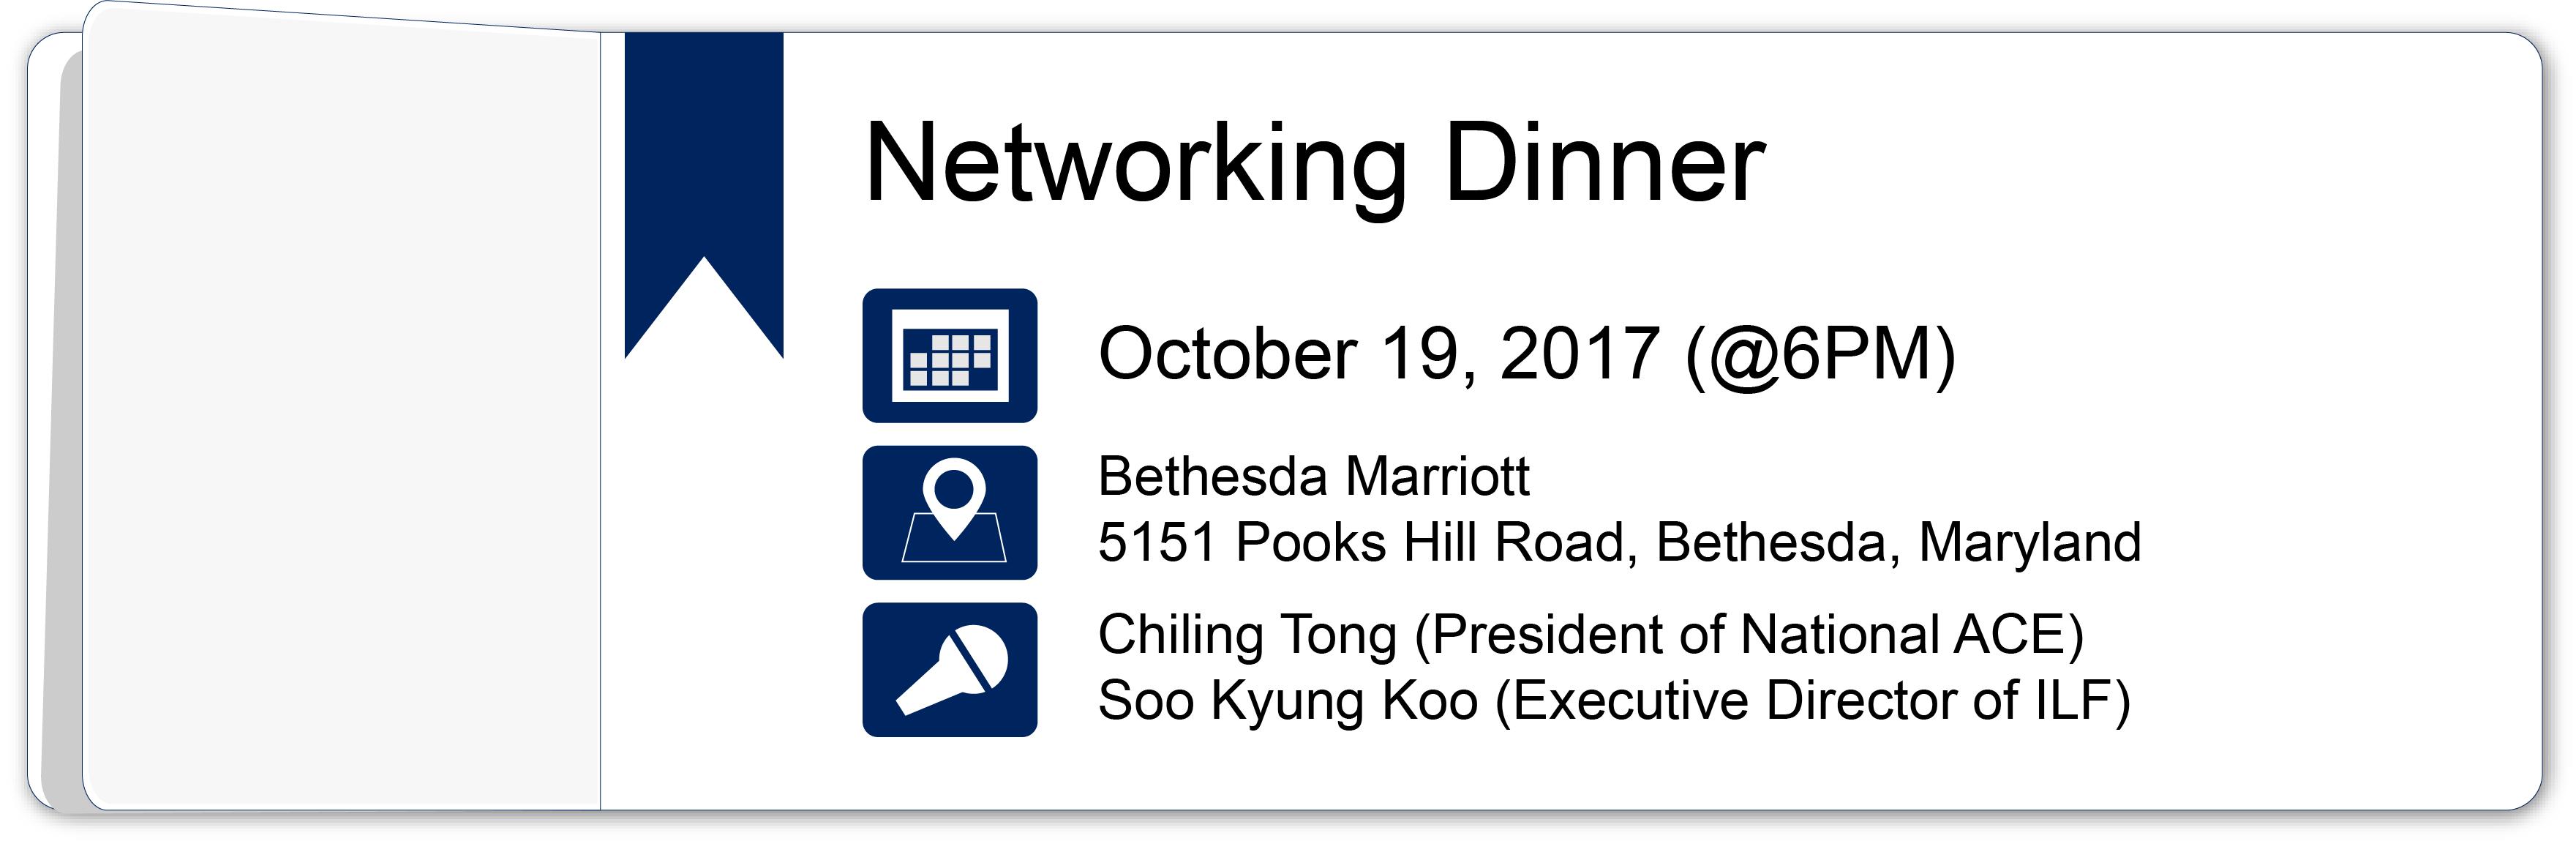 Networking Dinner – October 19, 2017